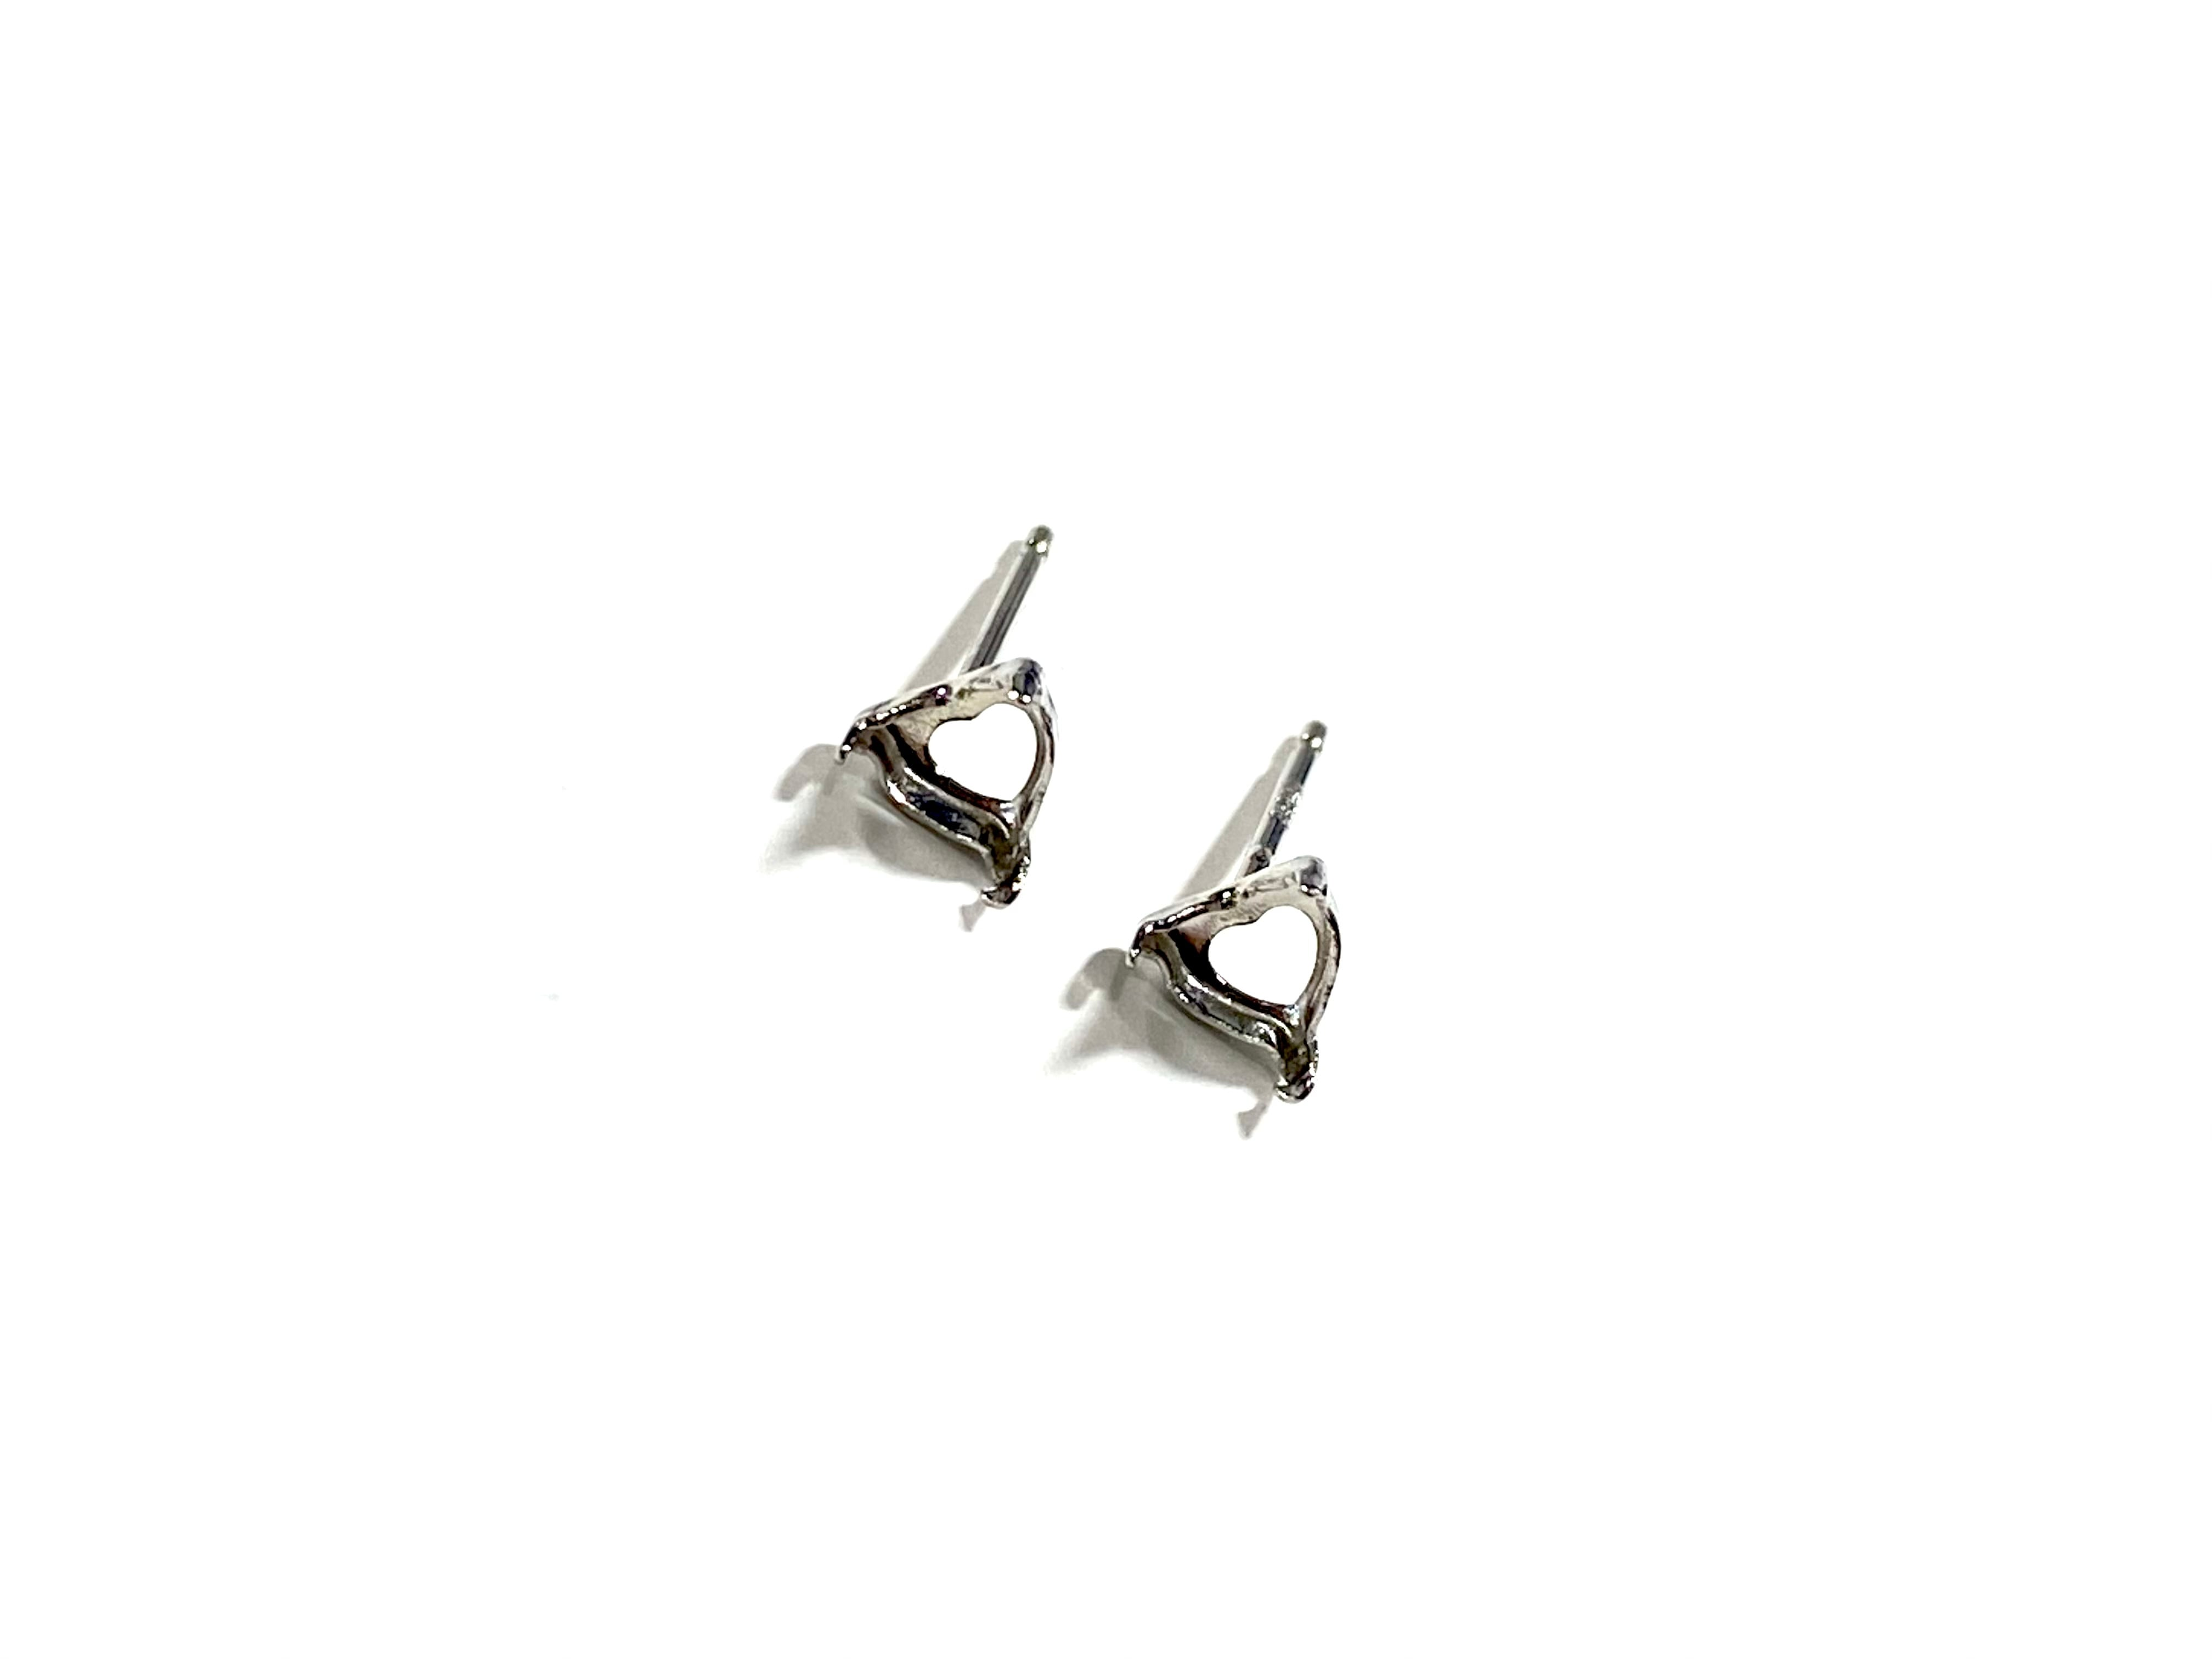 【K10WG】『タテヨコ3mm』ハートシェイプカット対応ピアス空枠 [空枠No,45]